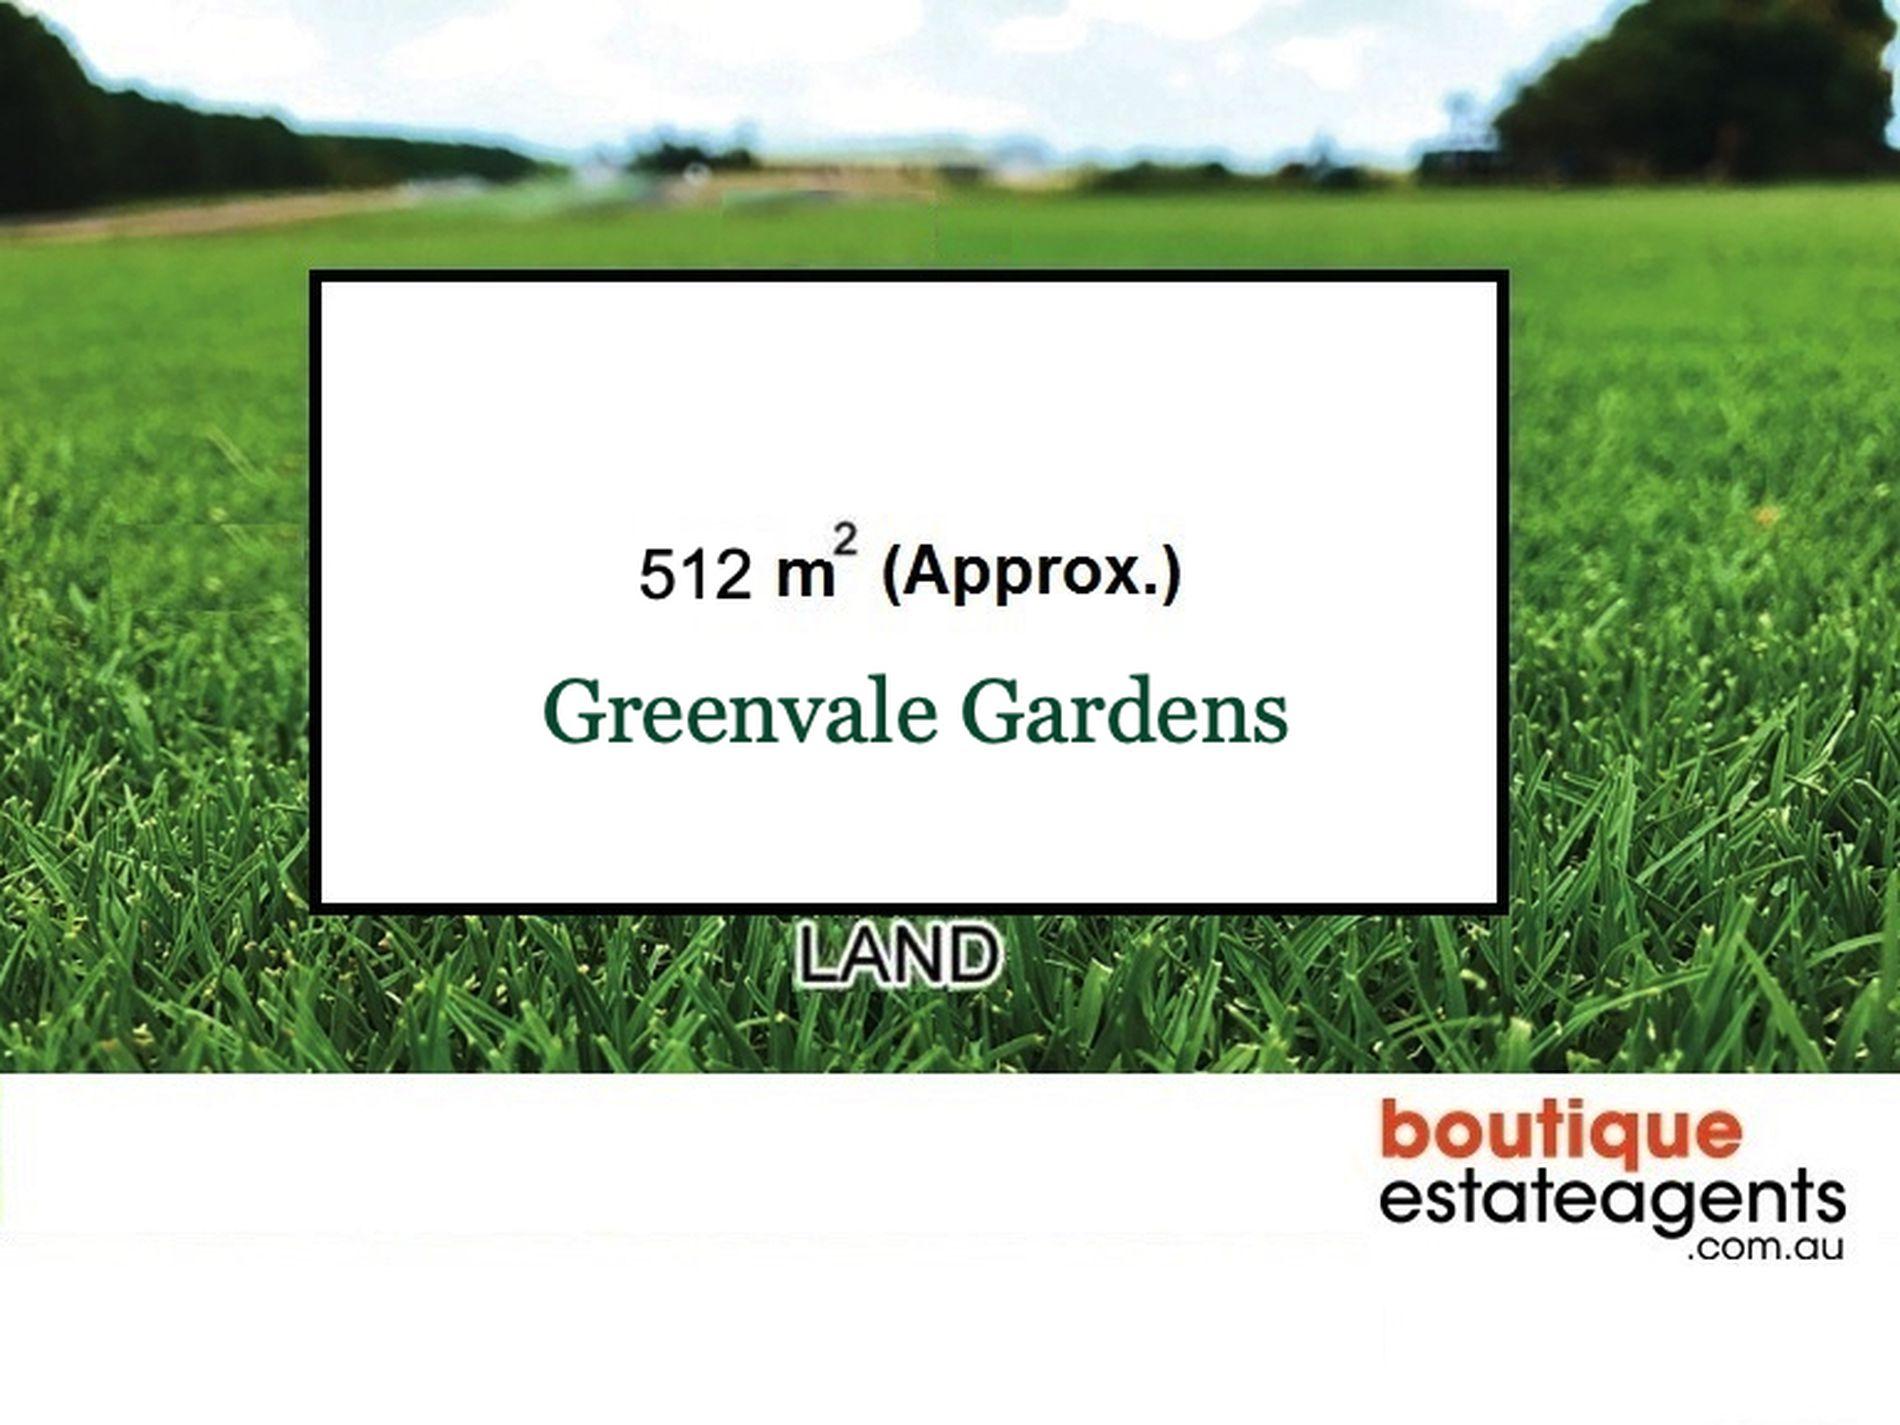 Greenvale